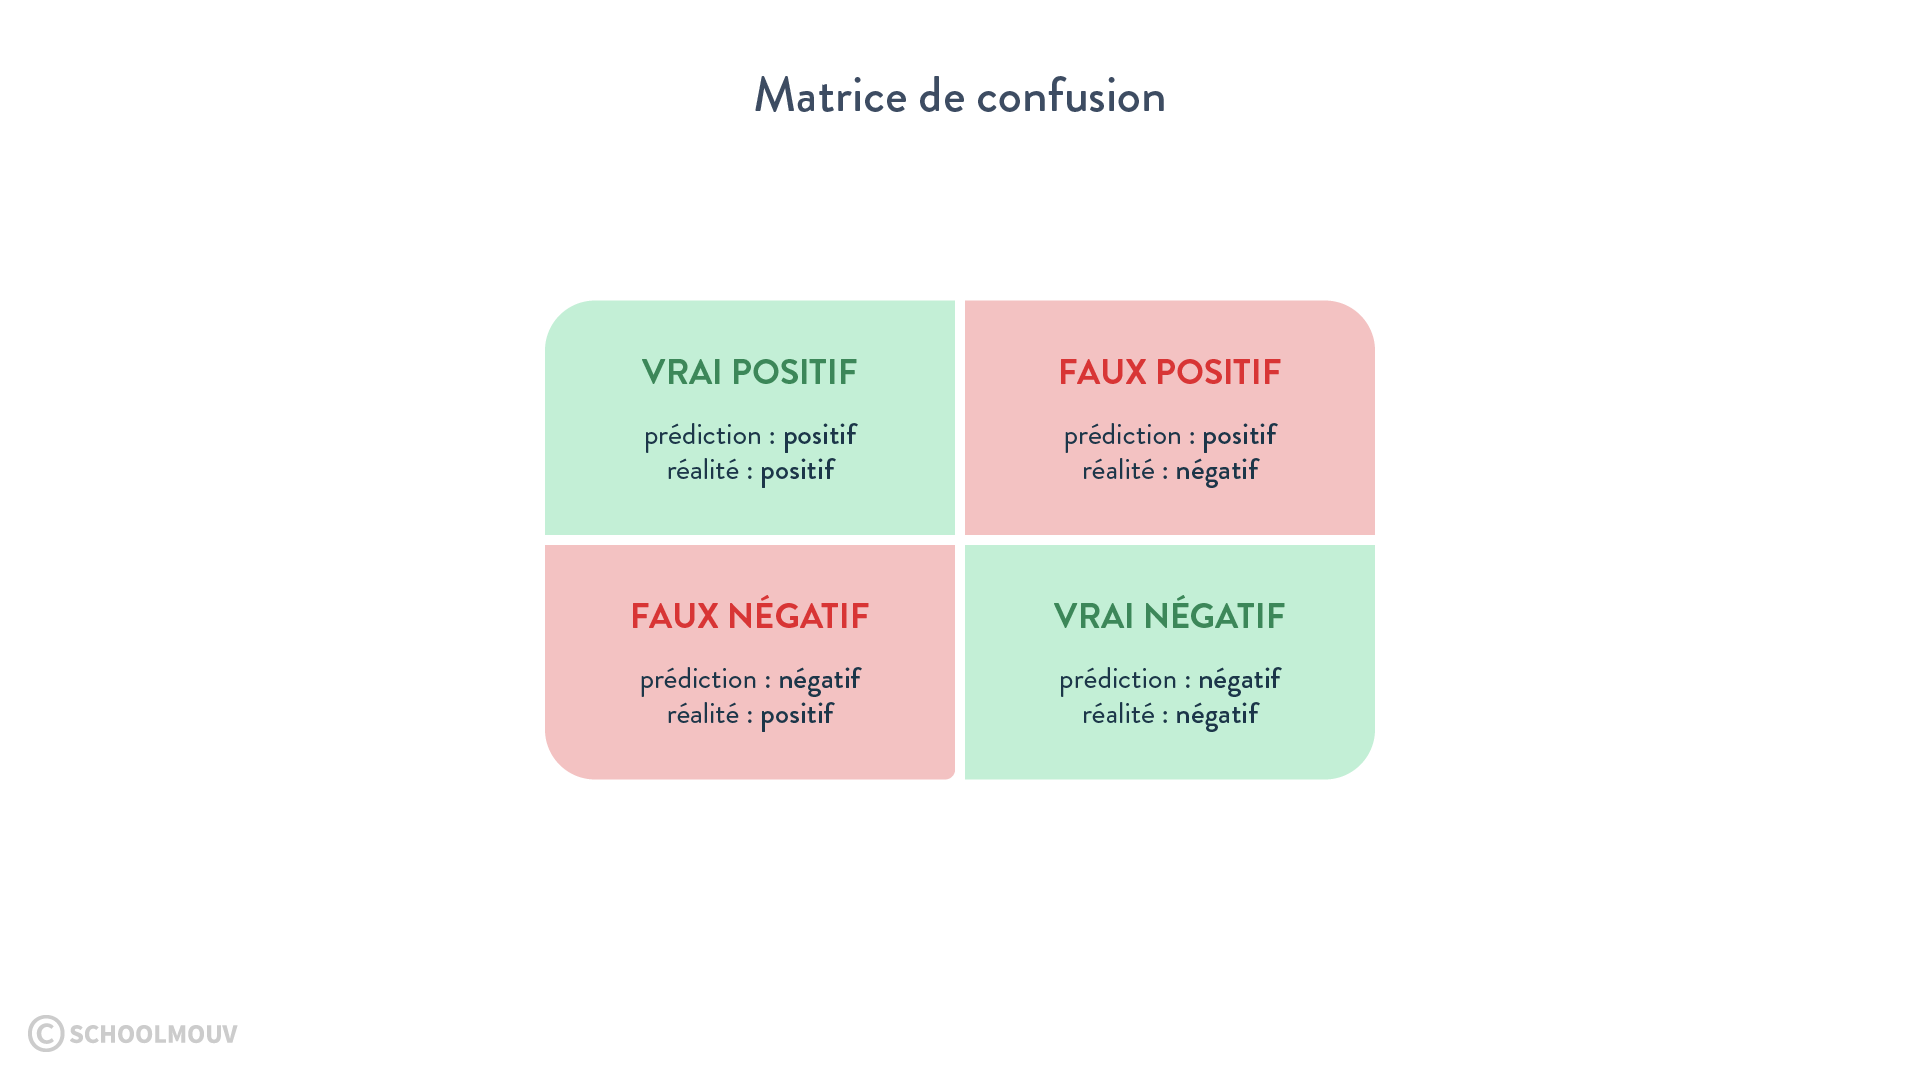 matrice de confusion